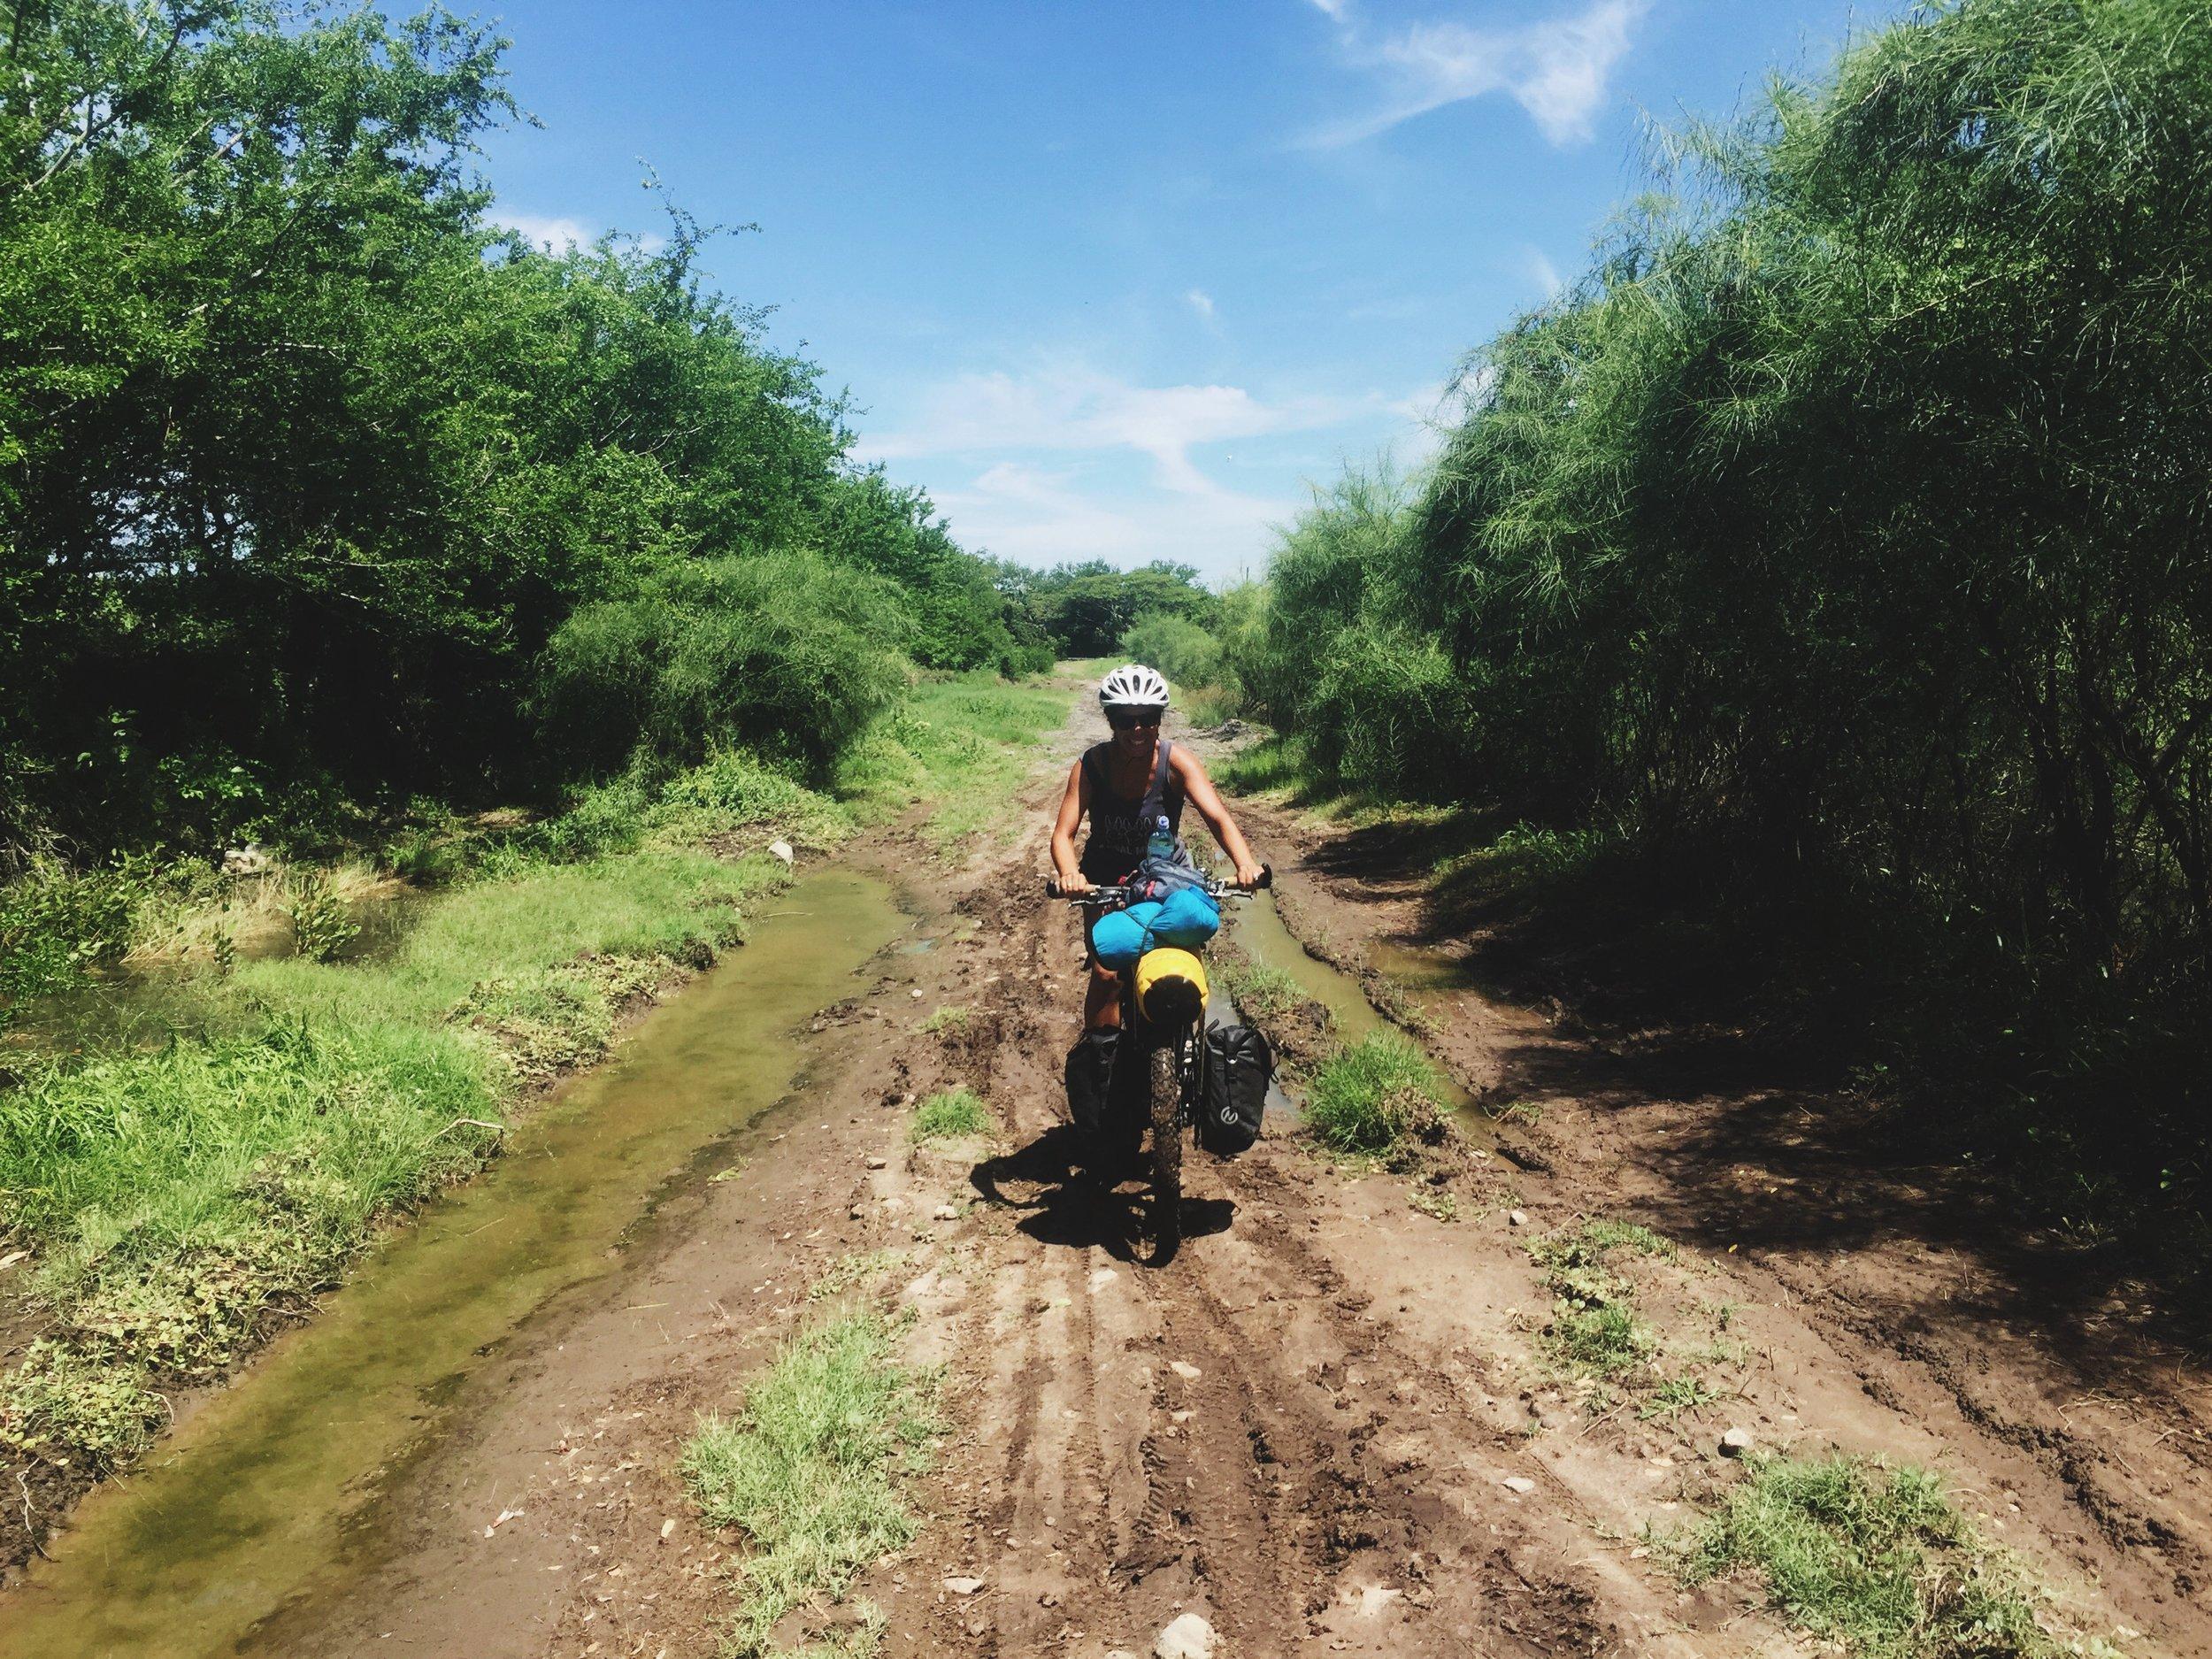 Wild muddy road fun